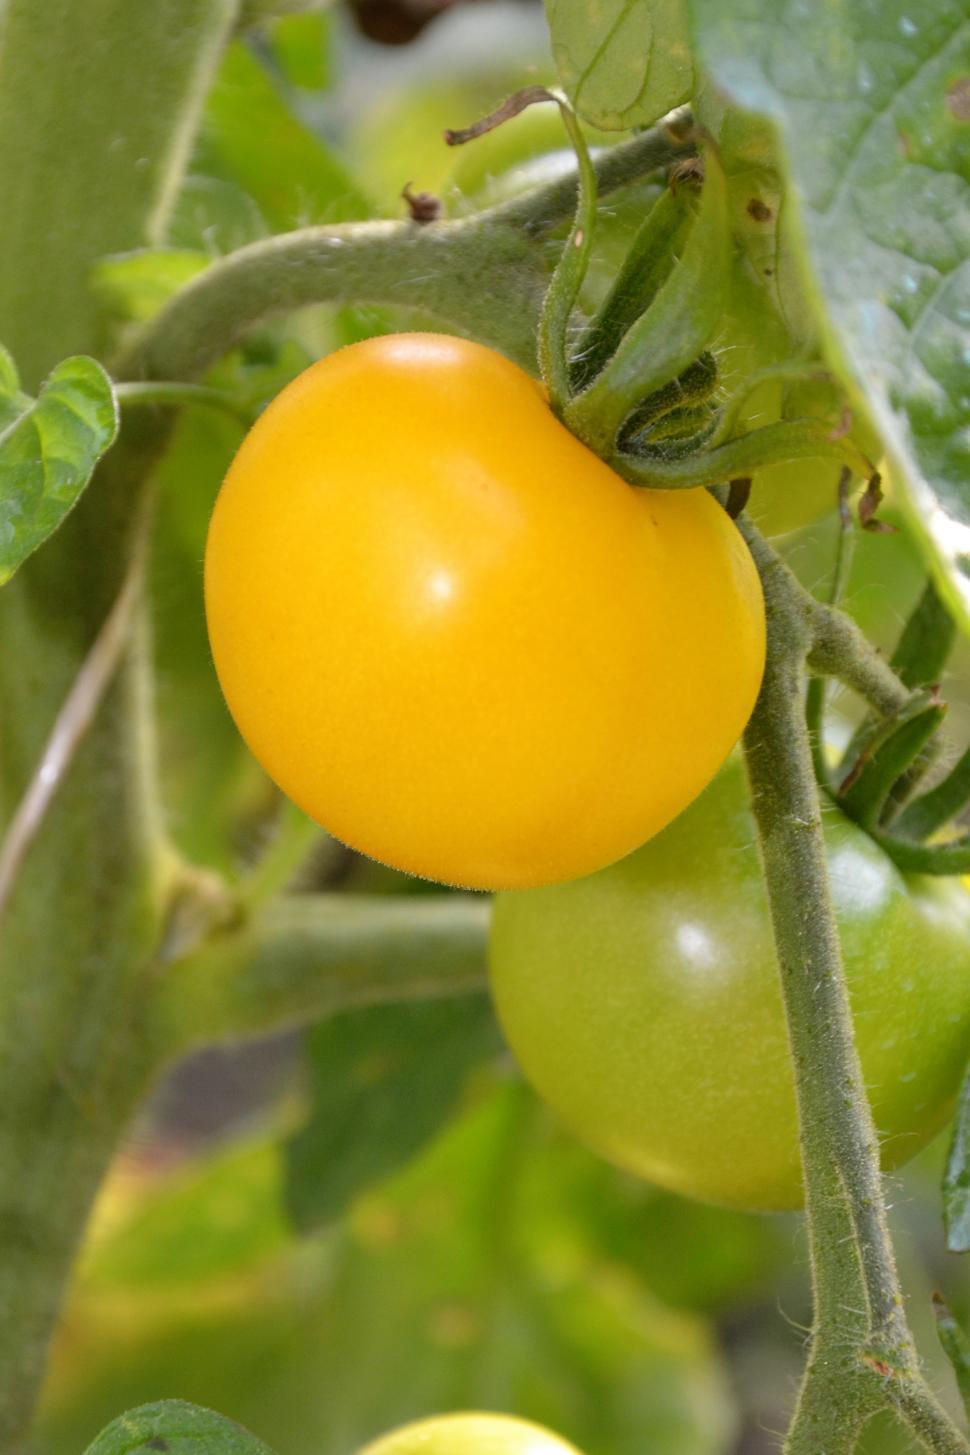 Download Free Stock Photo of Yellow tomato on vine